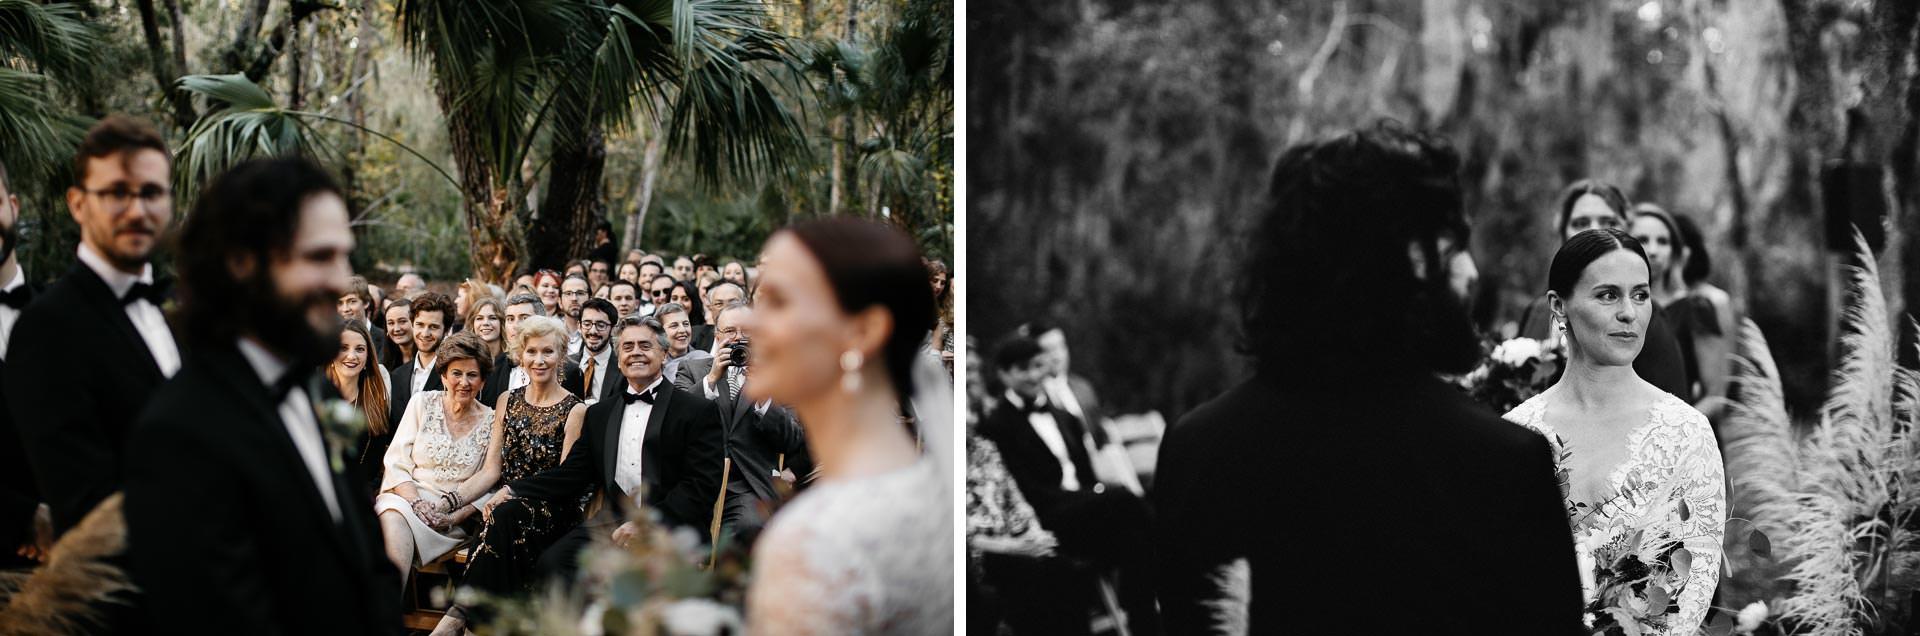 Amelia Island Wedding, Florida, by Jean-Laurent Gaudy